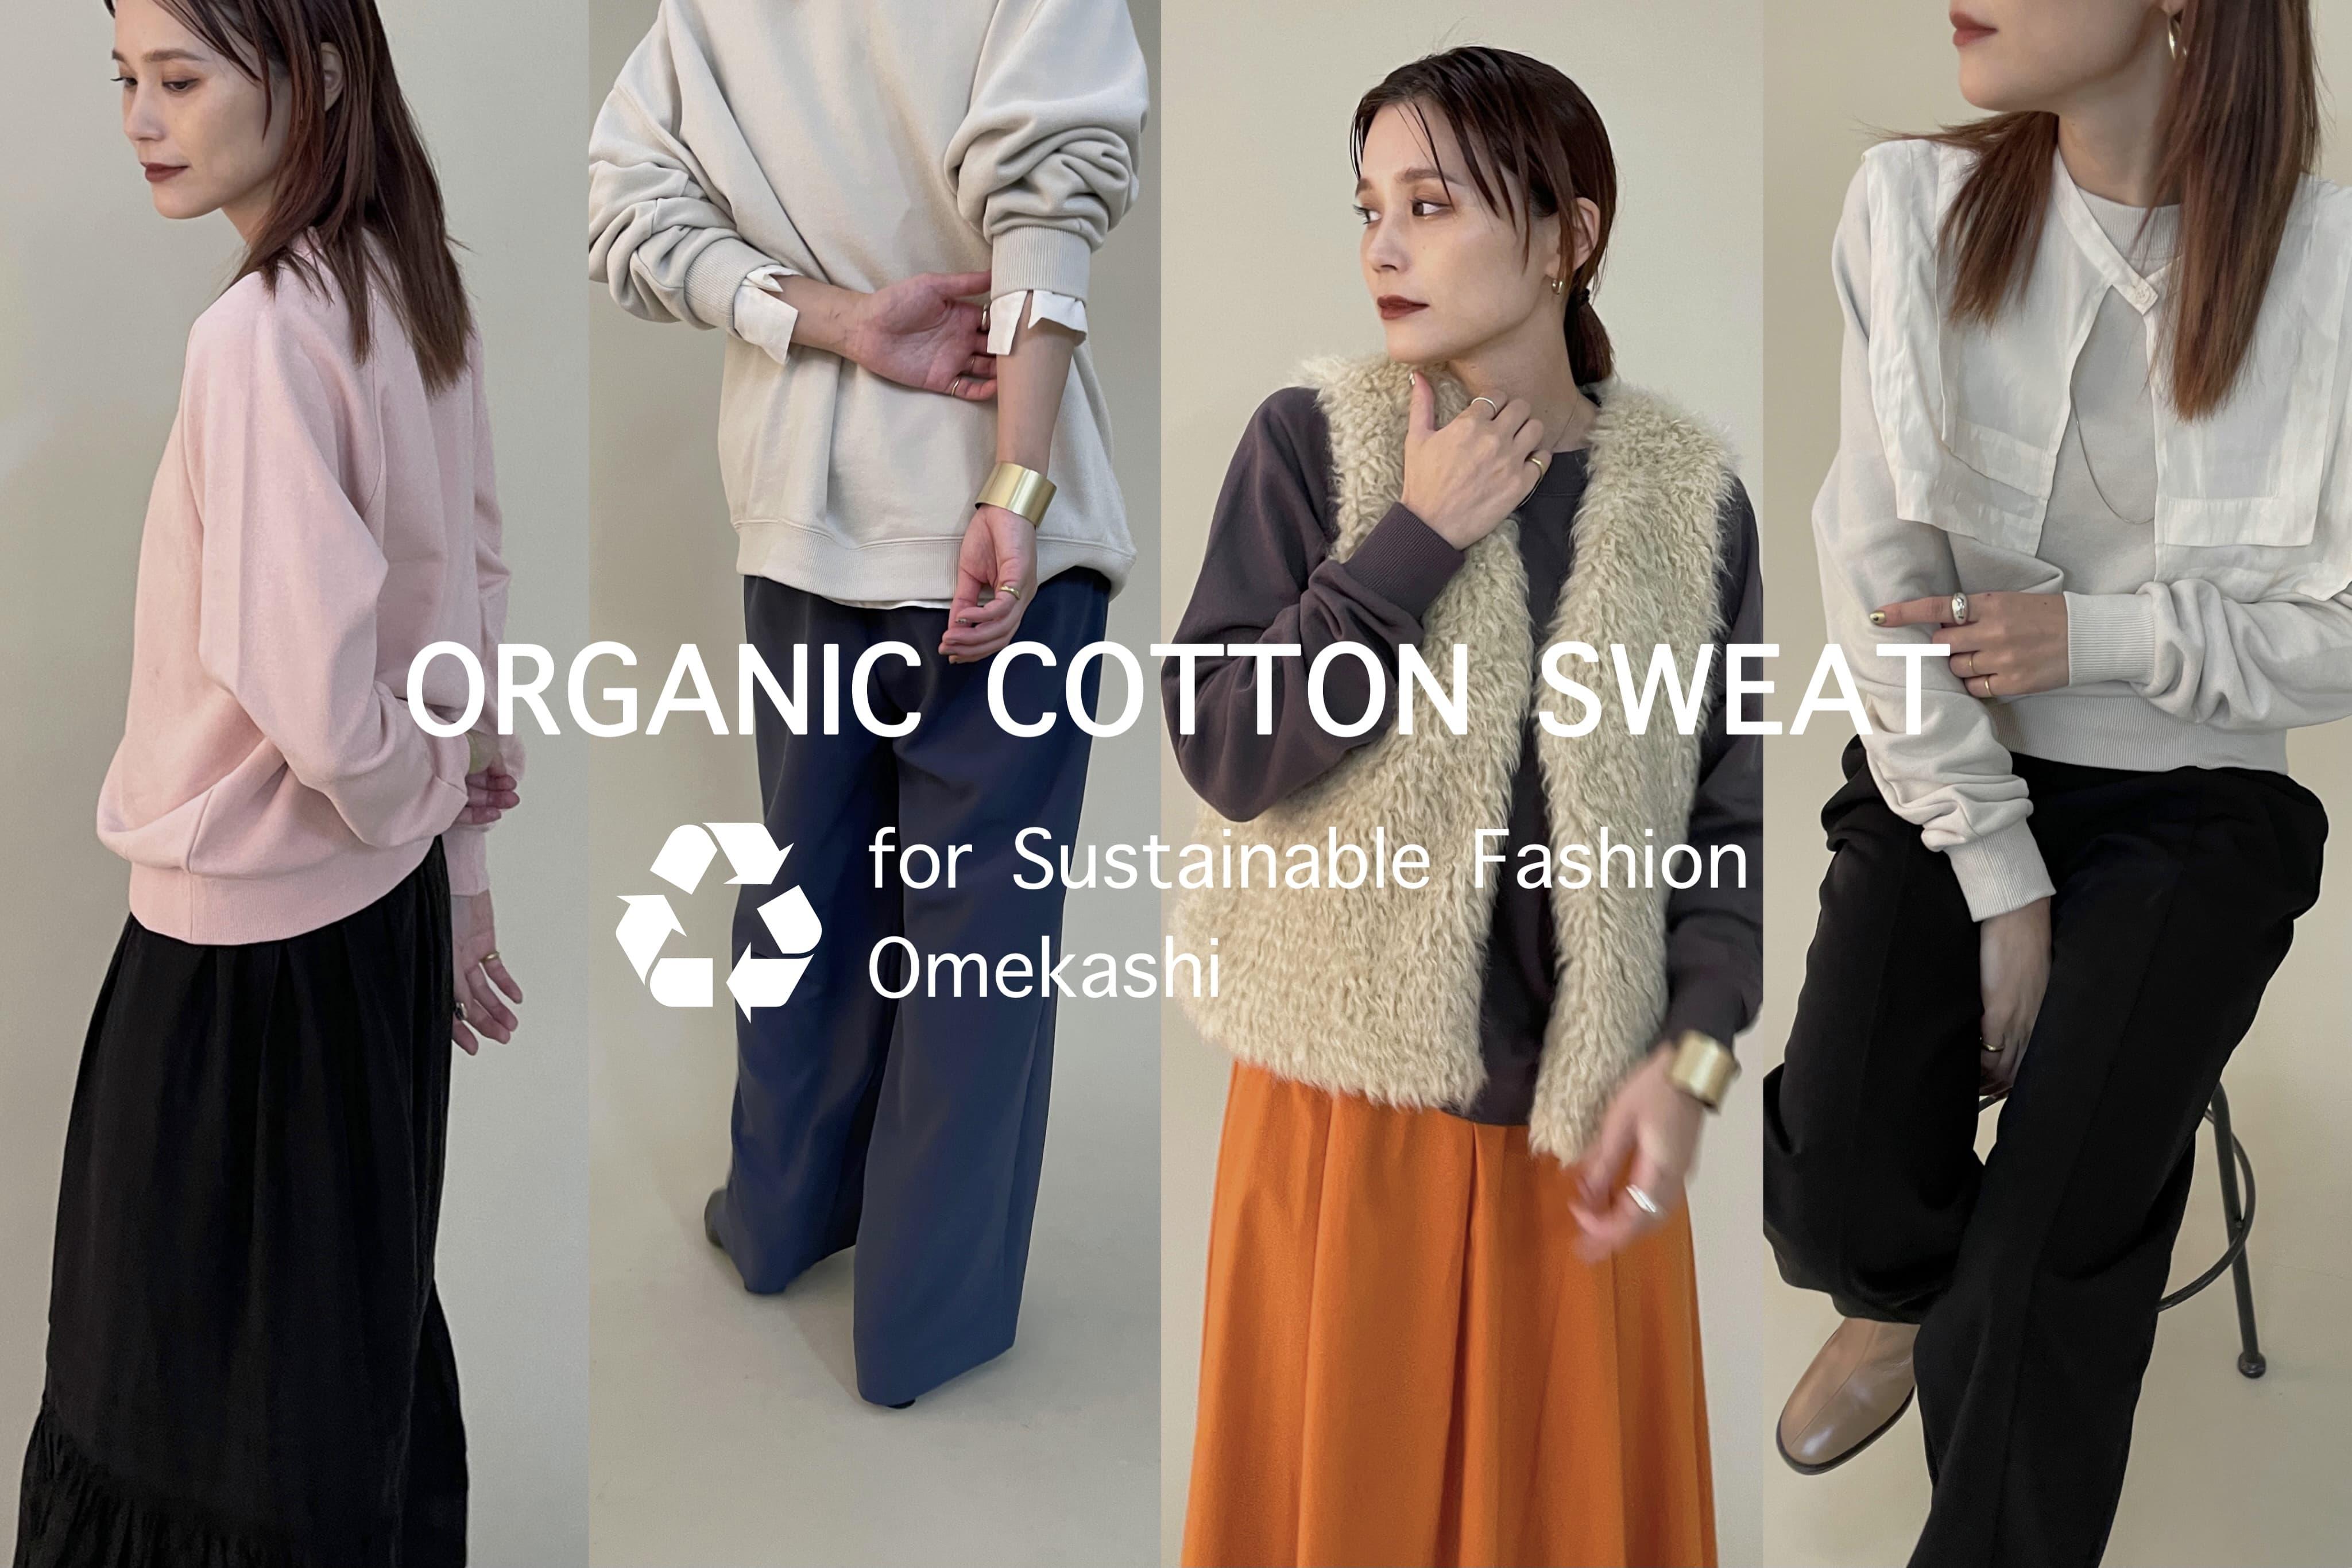 Omekashi 【100% ORGANIC COTTON SWEAT】おすすめのスタイリングをご紹介。